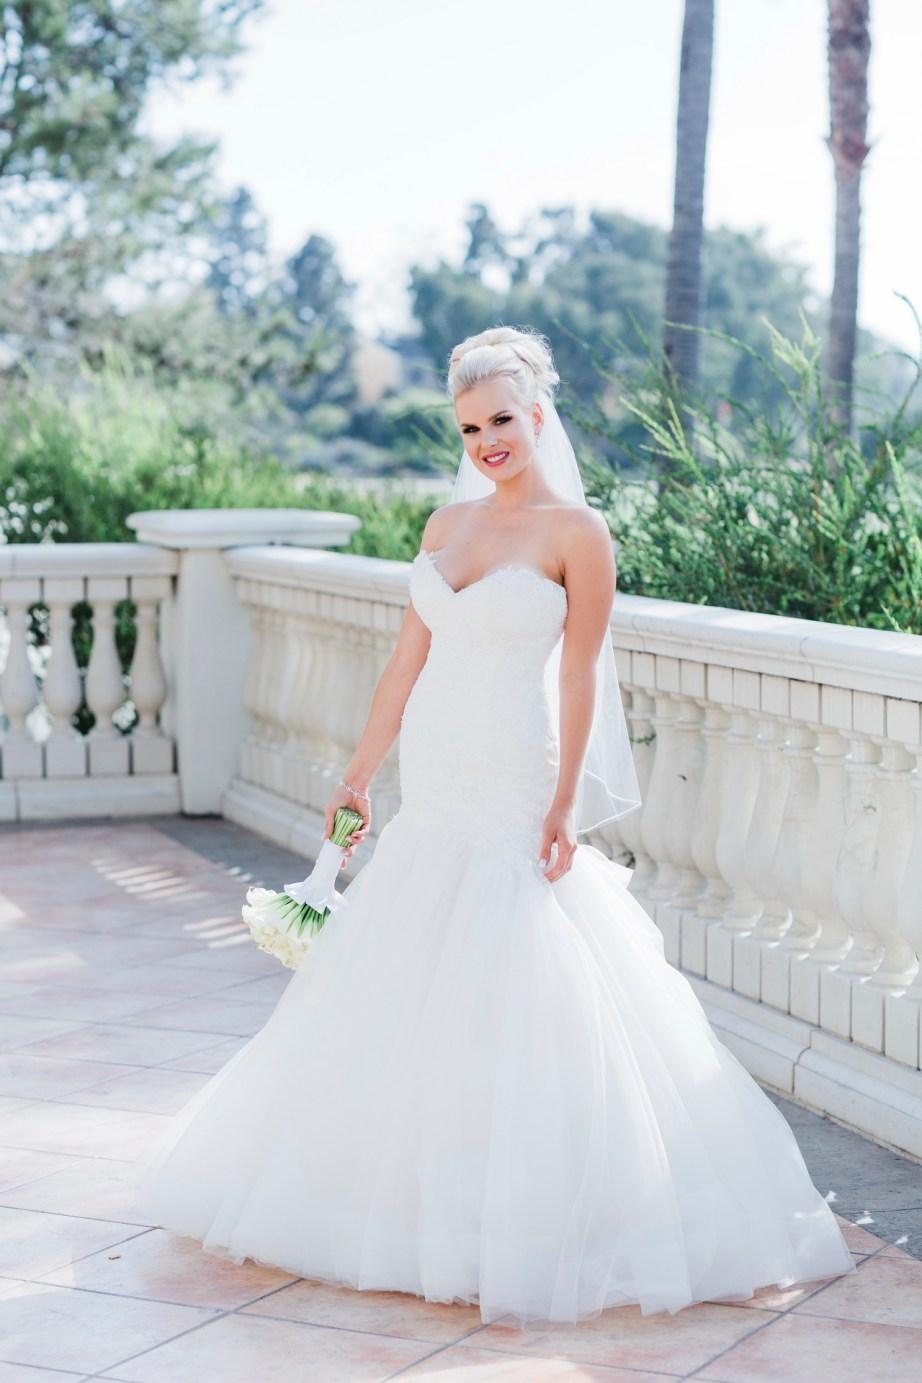 bride standing Monarch beach resort wedding photographer nicole caldwell